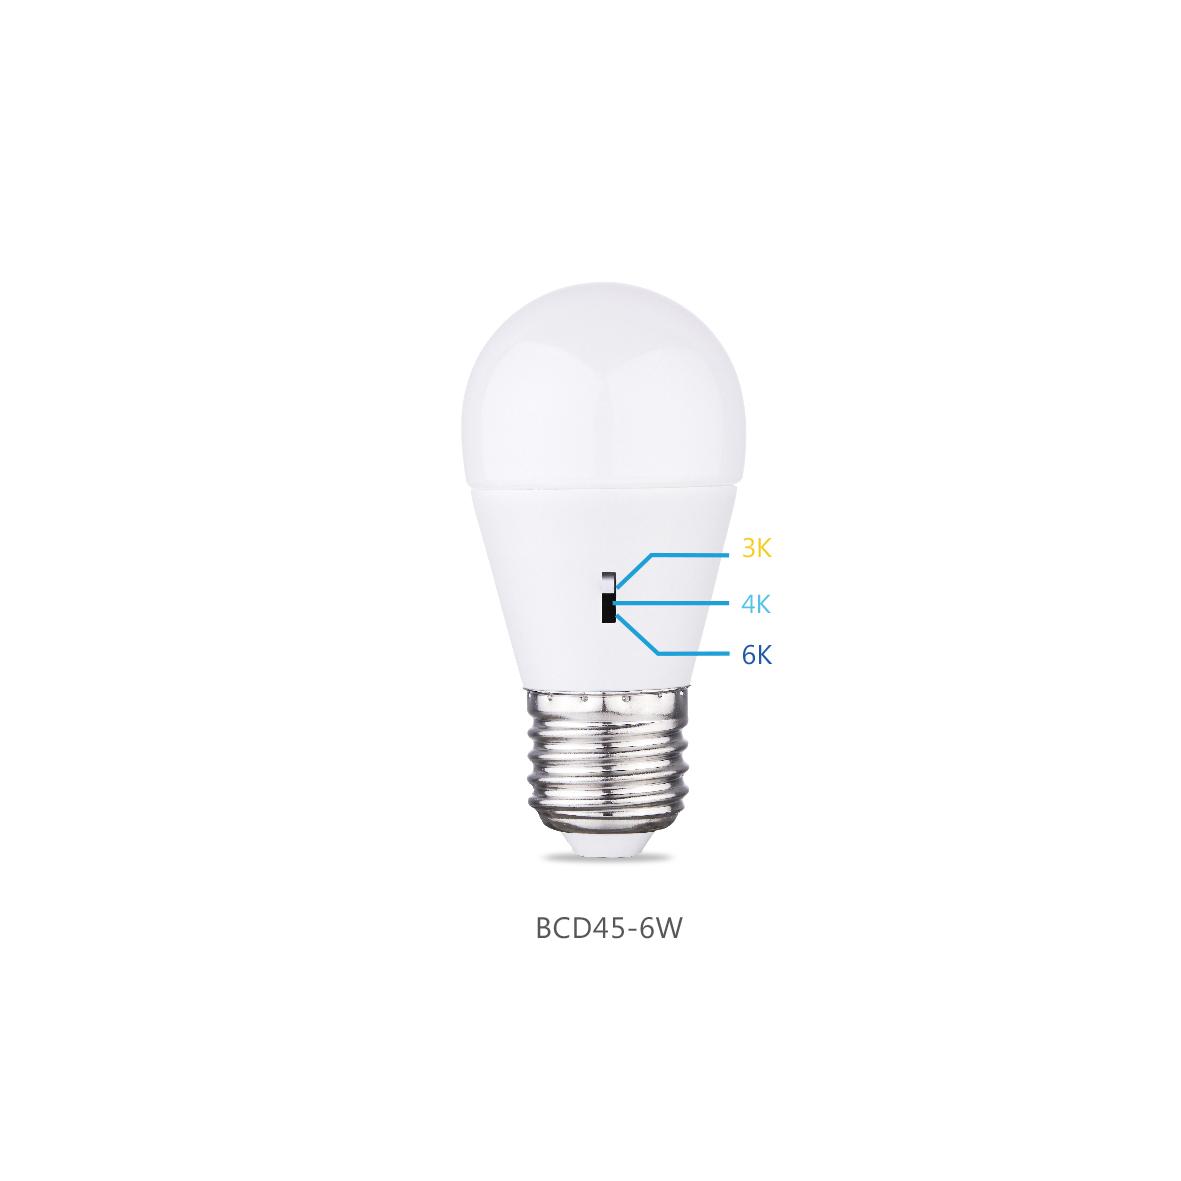 3CCT Patent Bulb BCD45-6W